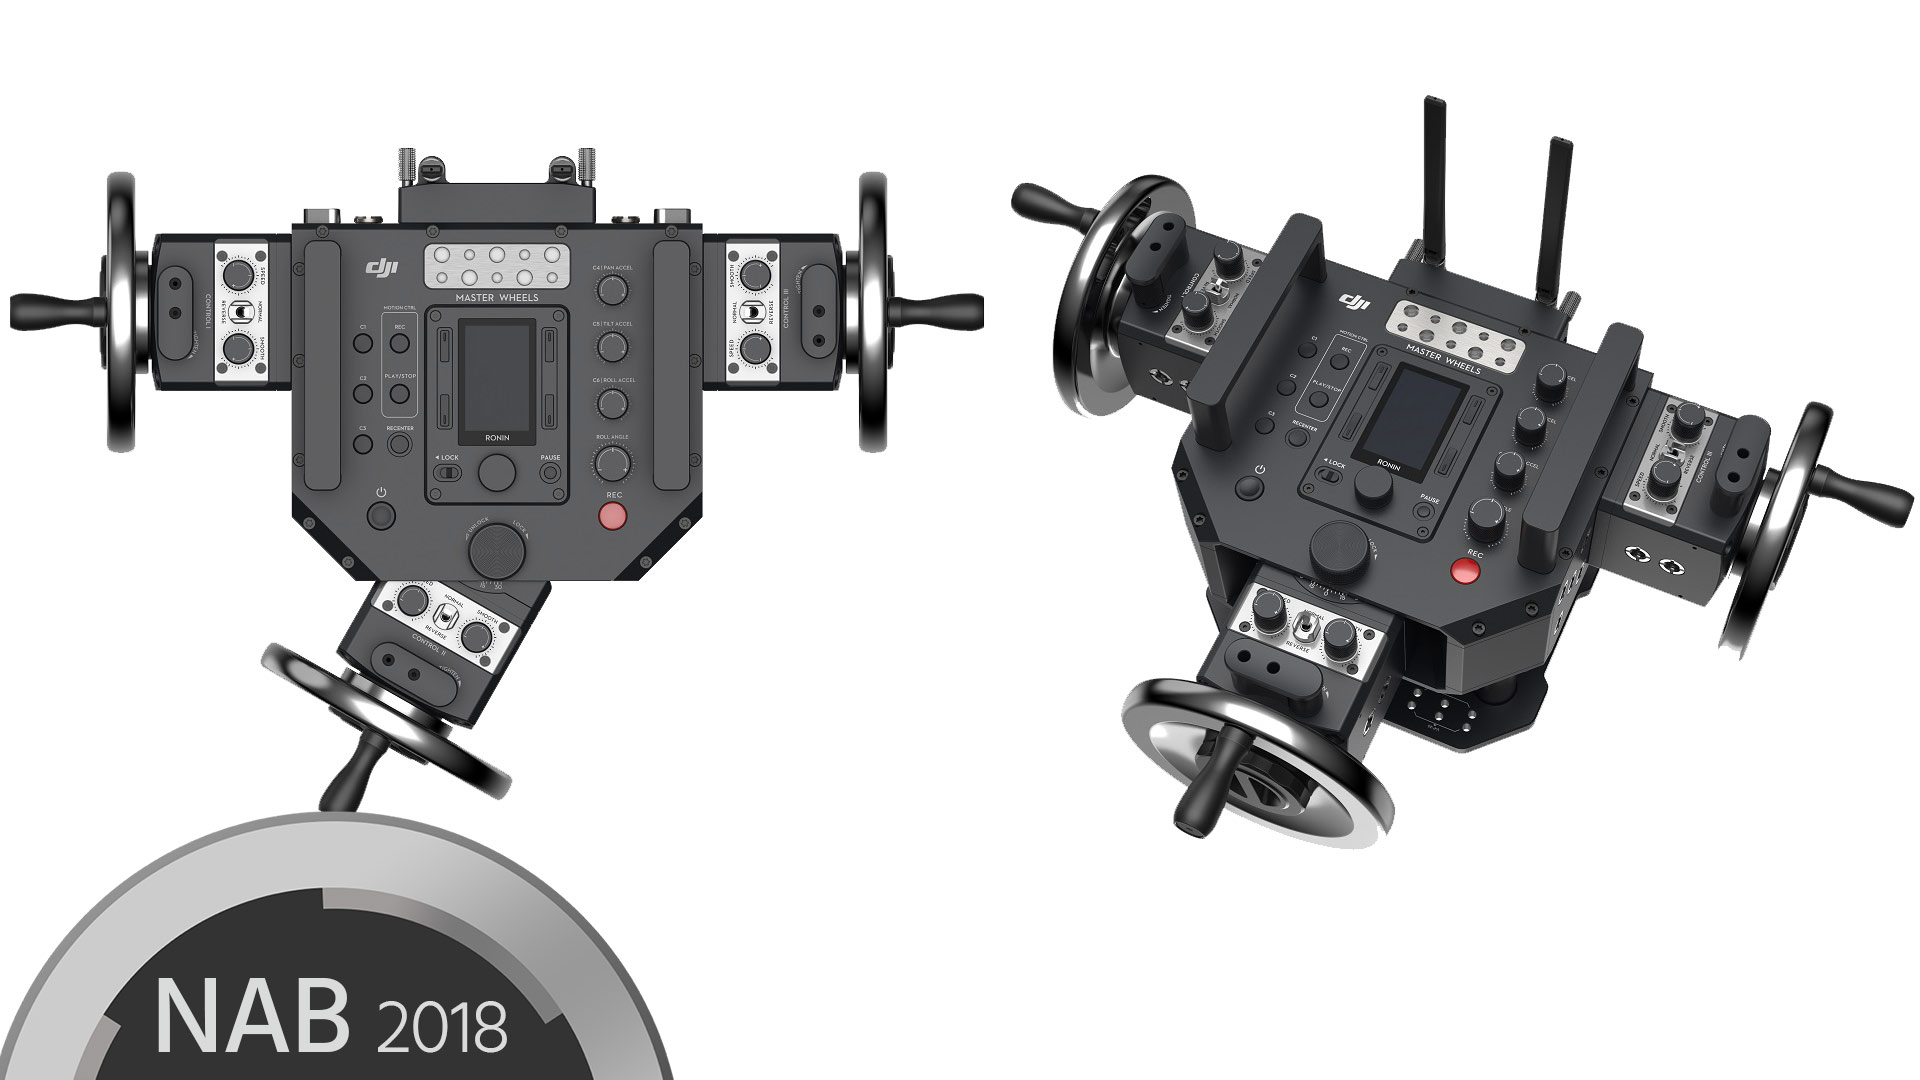 DJIがMaster WheelsとForce Proを発表 - リモートジンバルコントロール